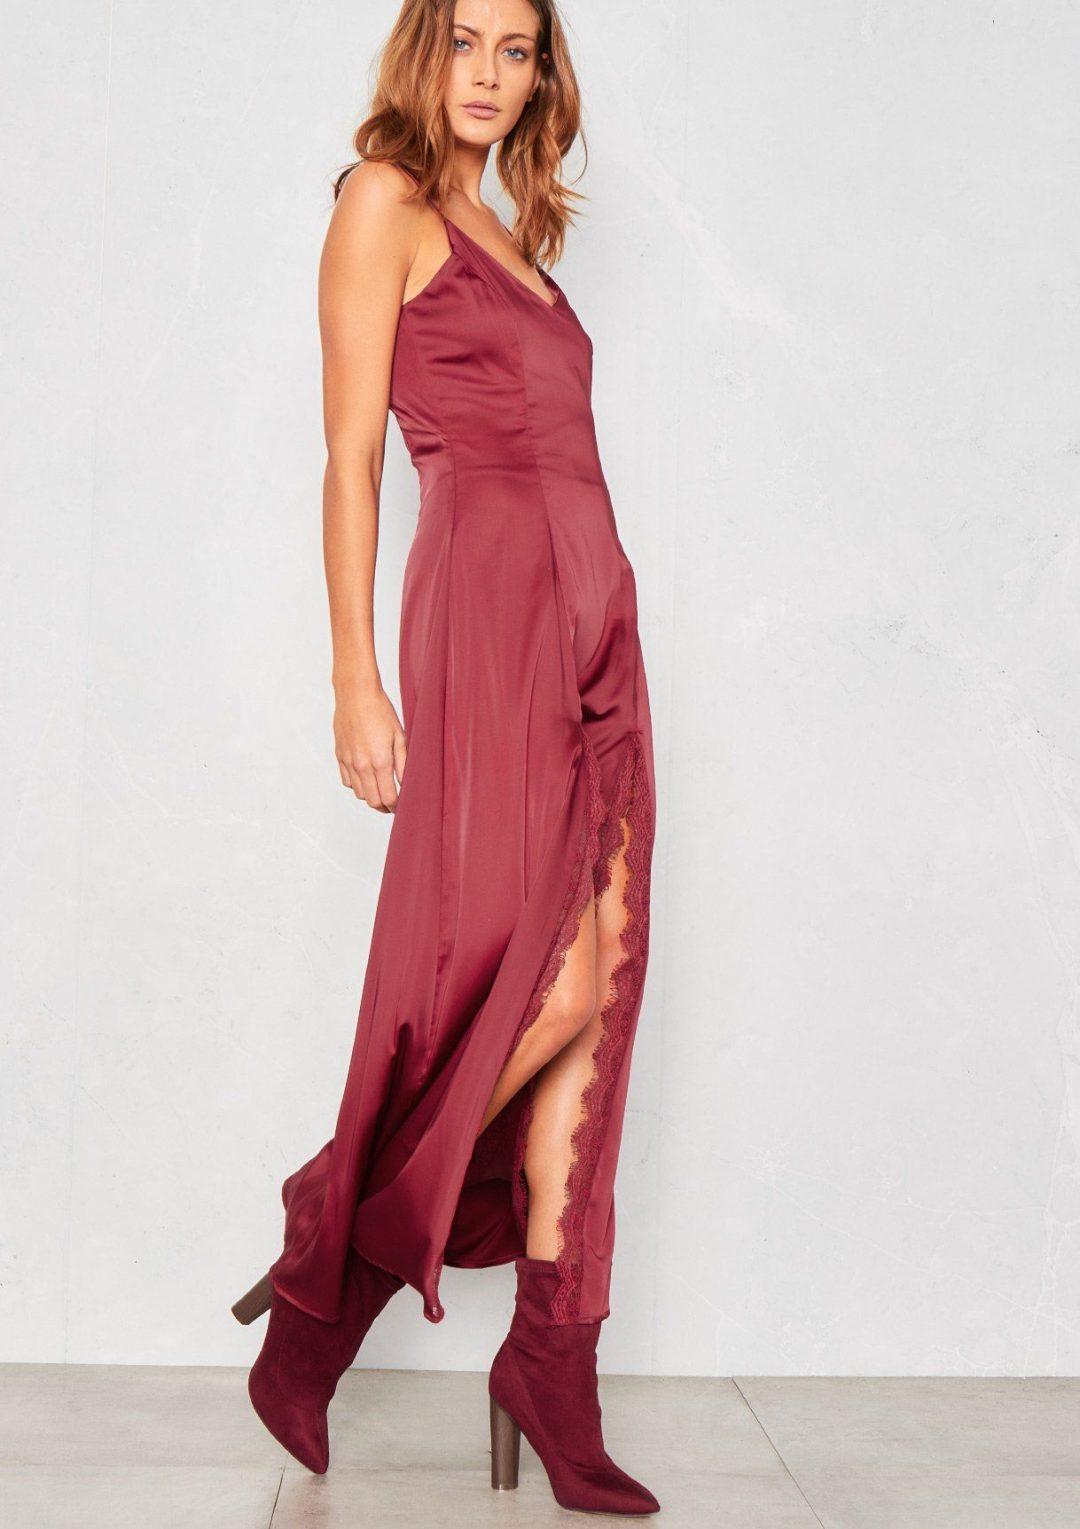 Wine red summer maxi dress satin